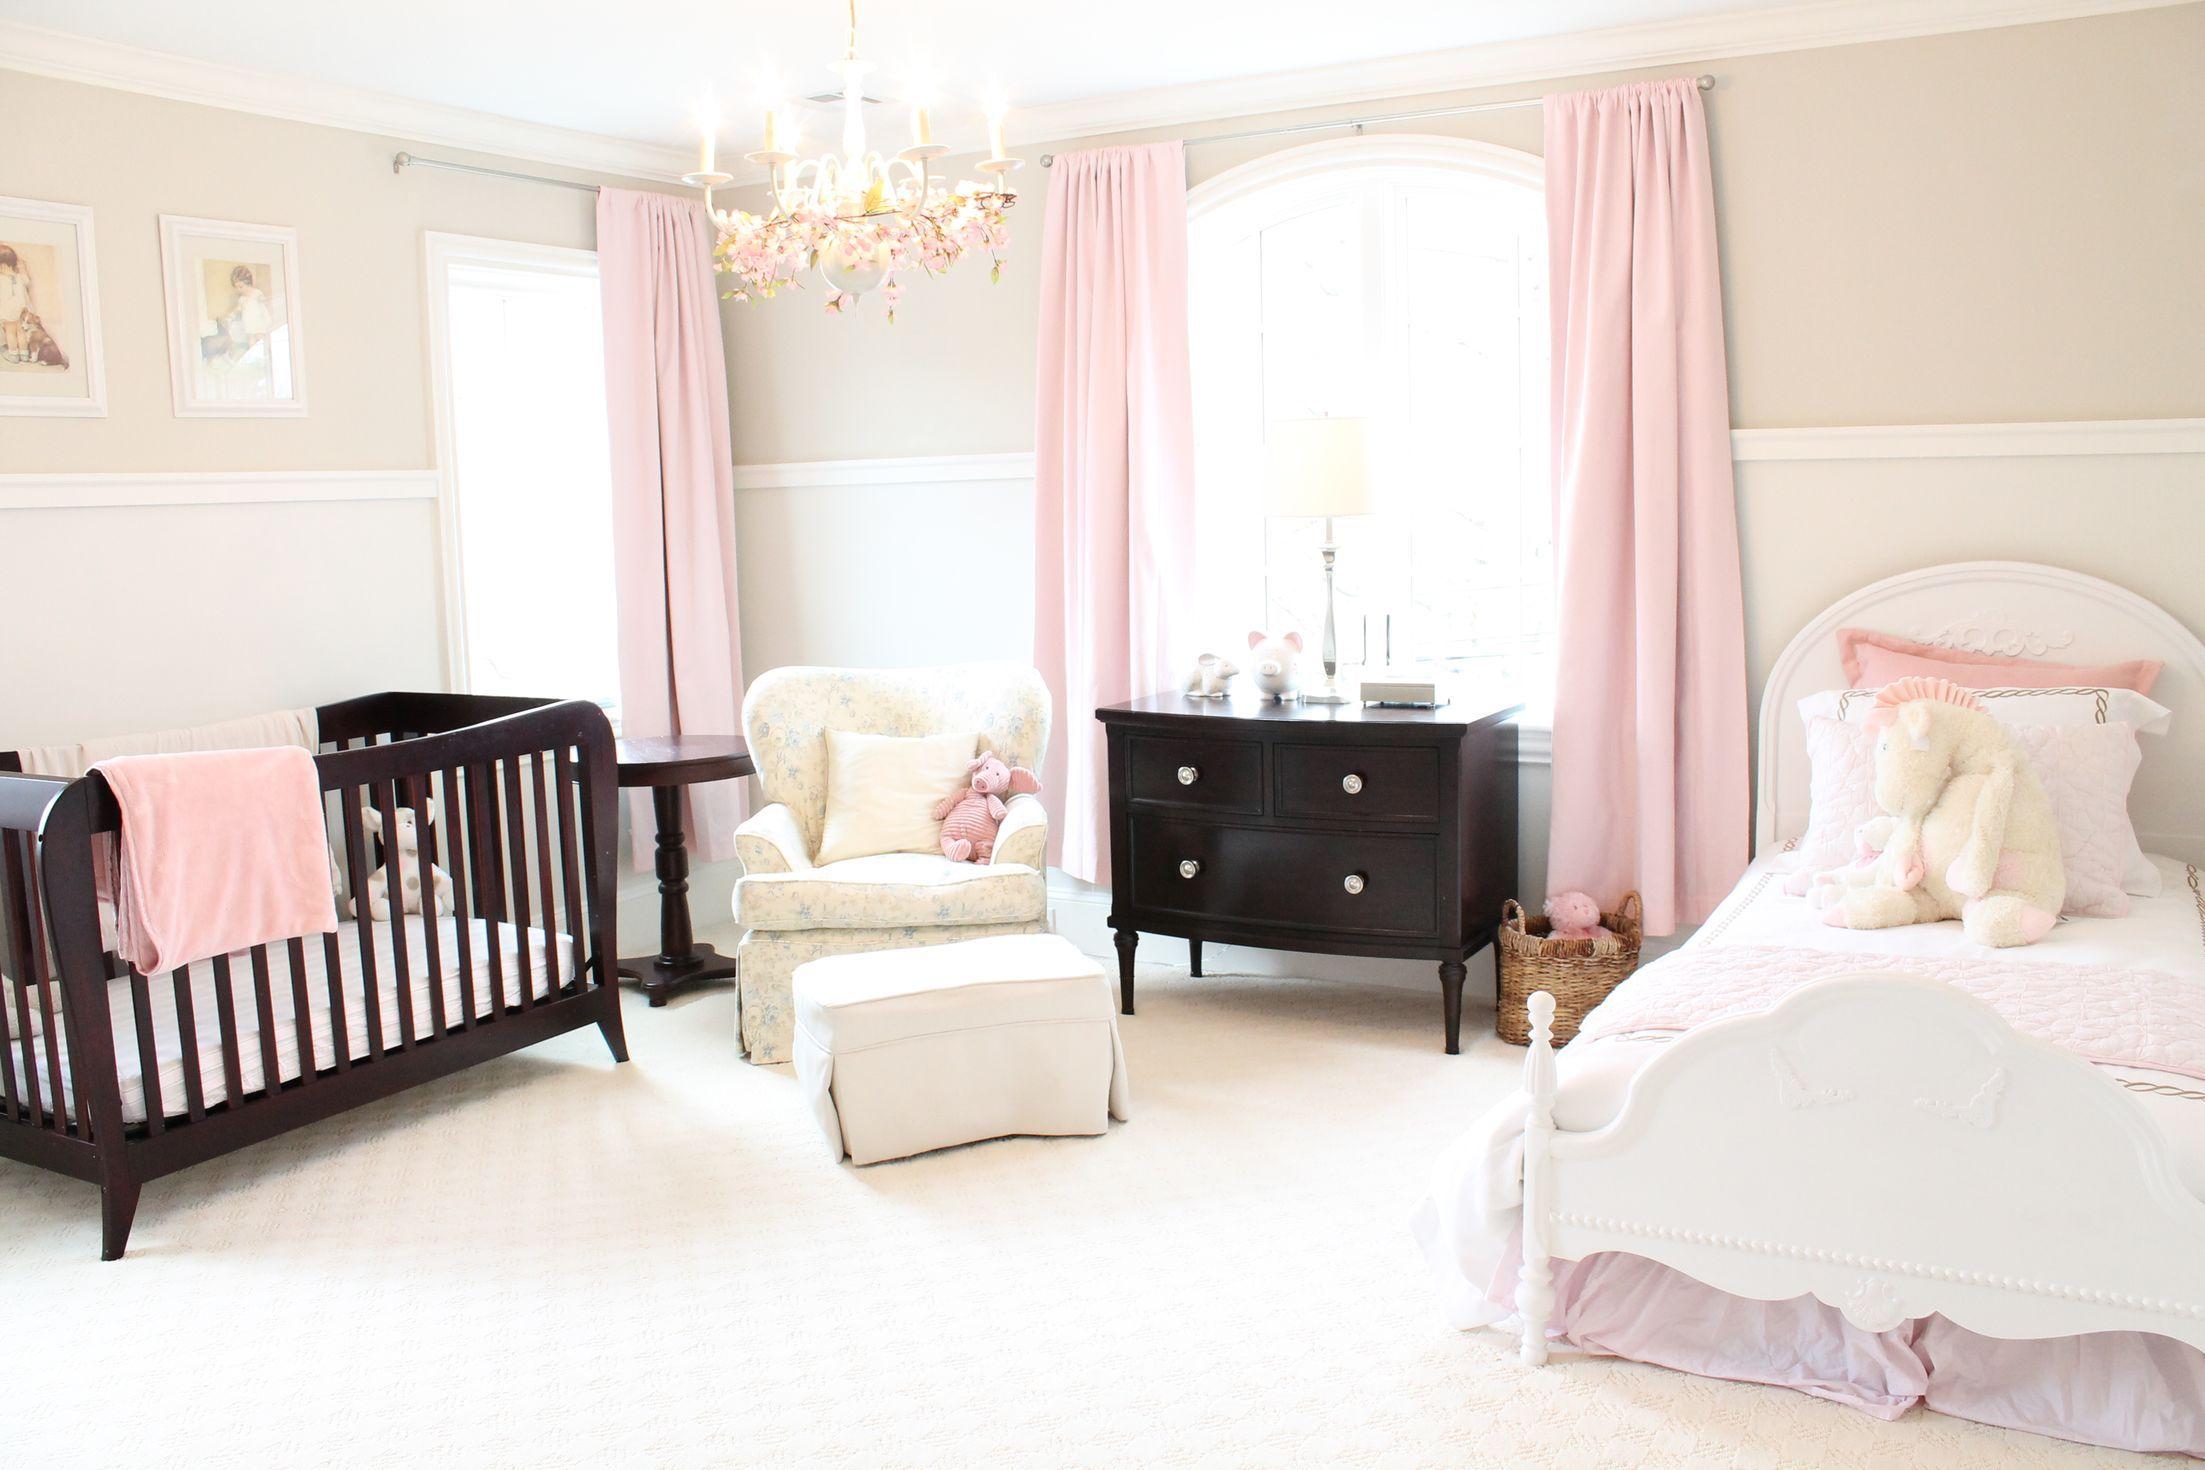 25 Baby Girl Nursery Ideas for 2018 | Crib, Dresser and Nursery